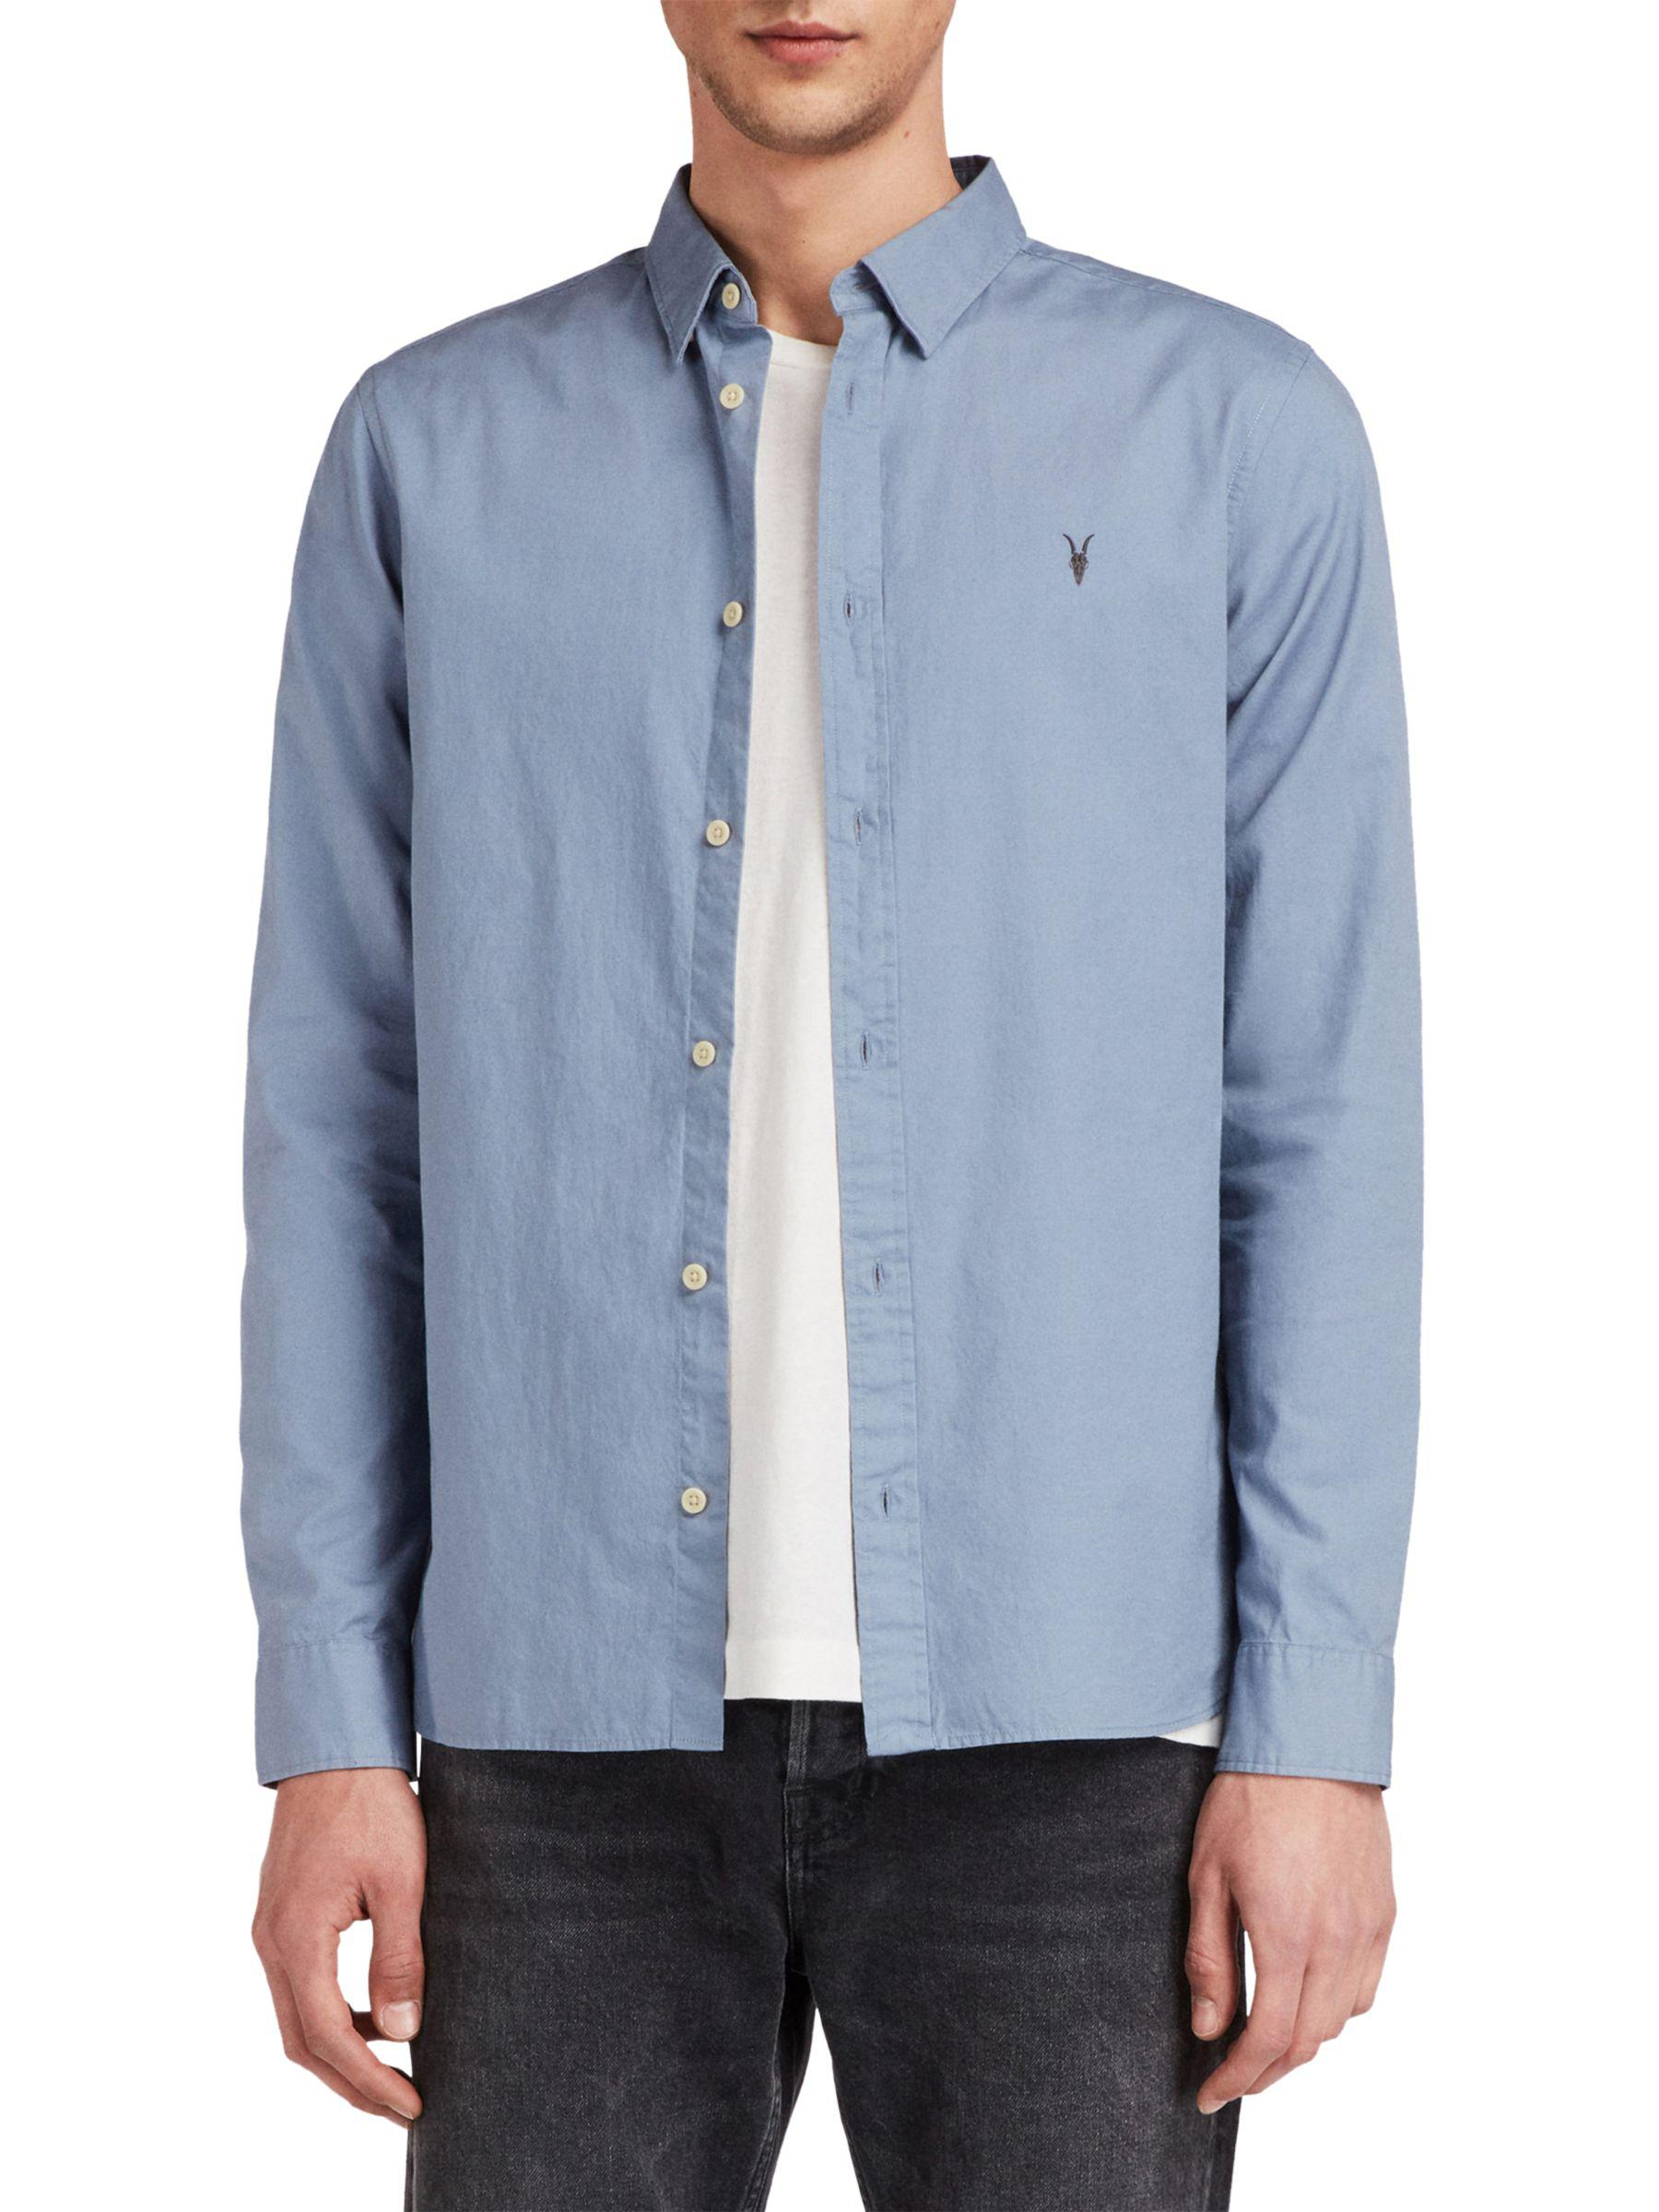 349864dceb27 AllSaints. Men's Gray Redondo Plain Cotton Shirt. £70 £39 + £3.50 shipping  From John Lewis ...